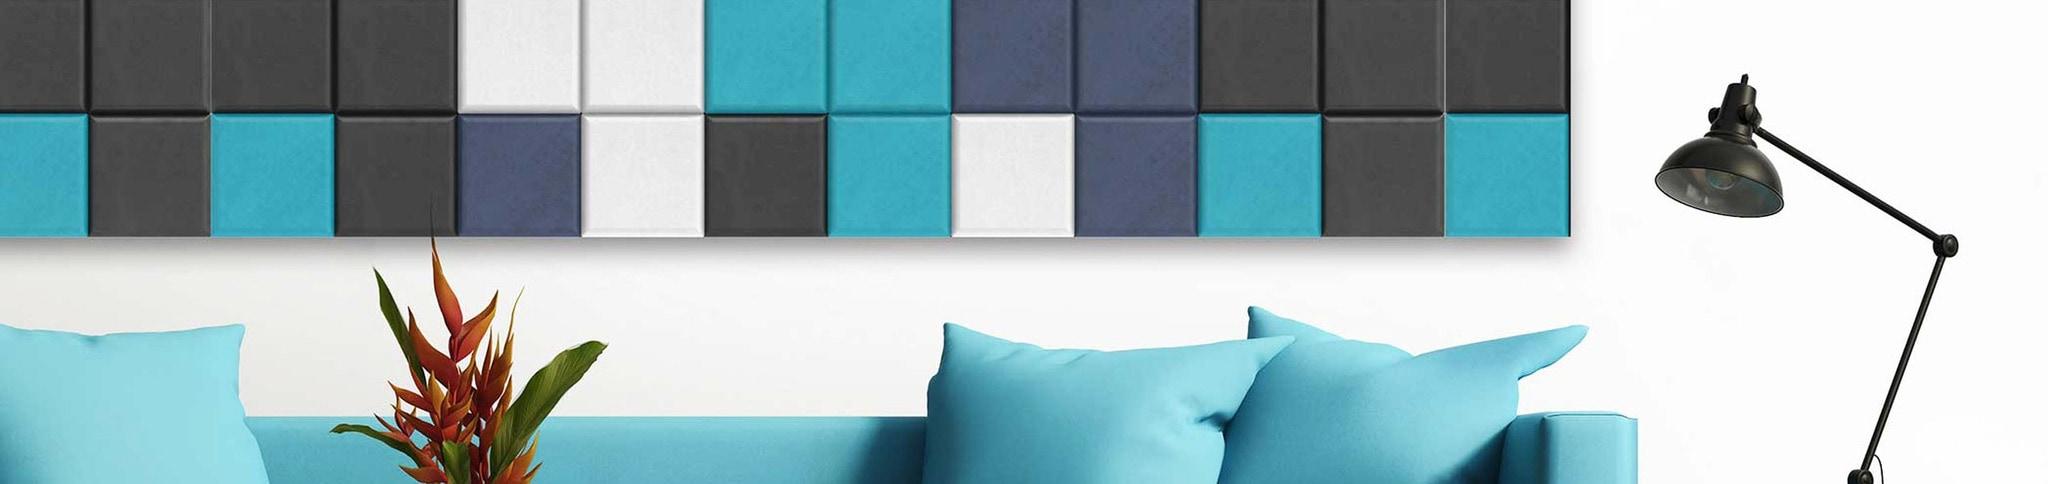 Artnovion blue and white designer acoustic panels on wall